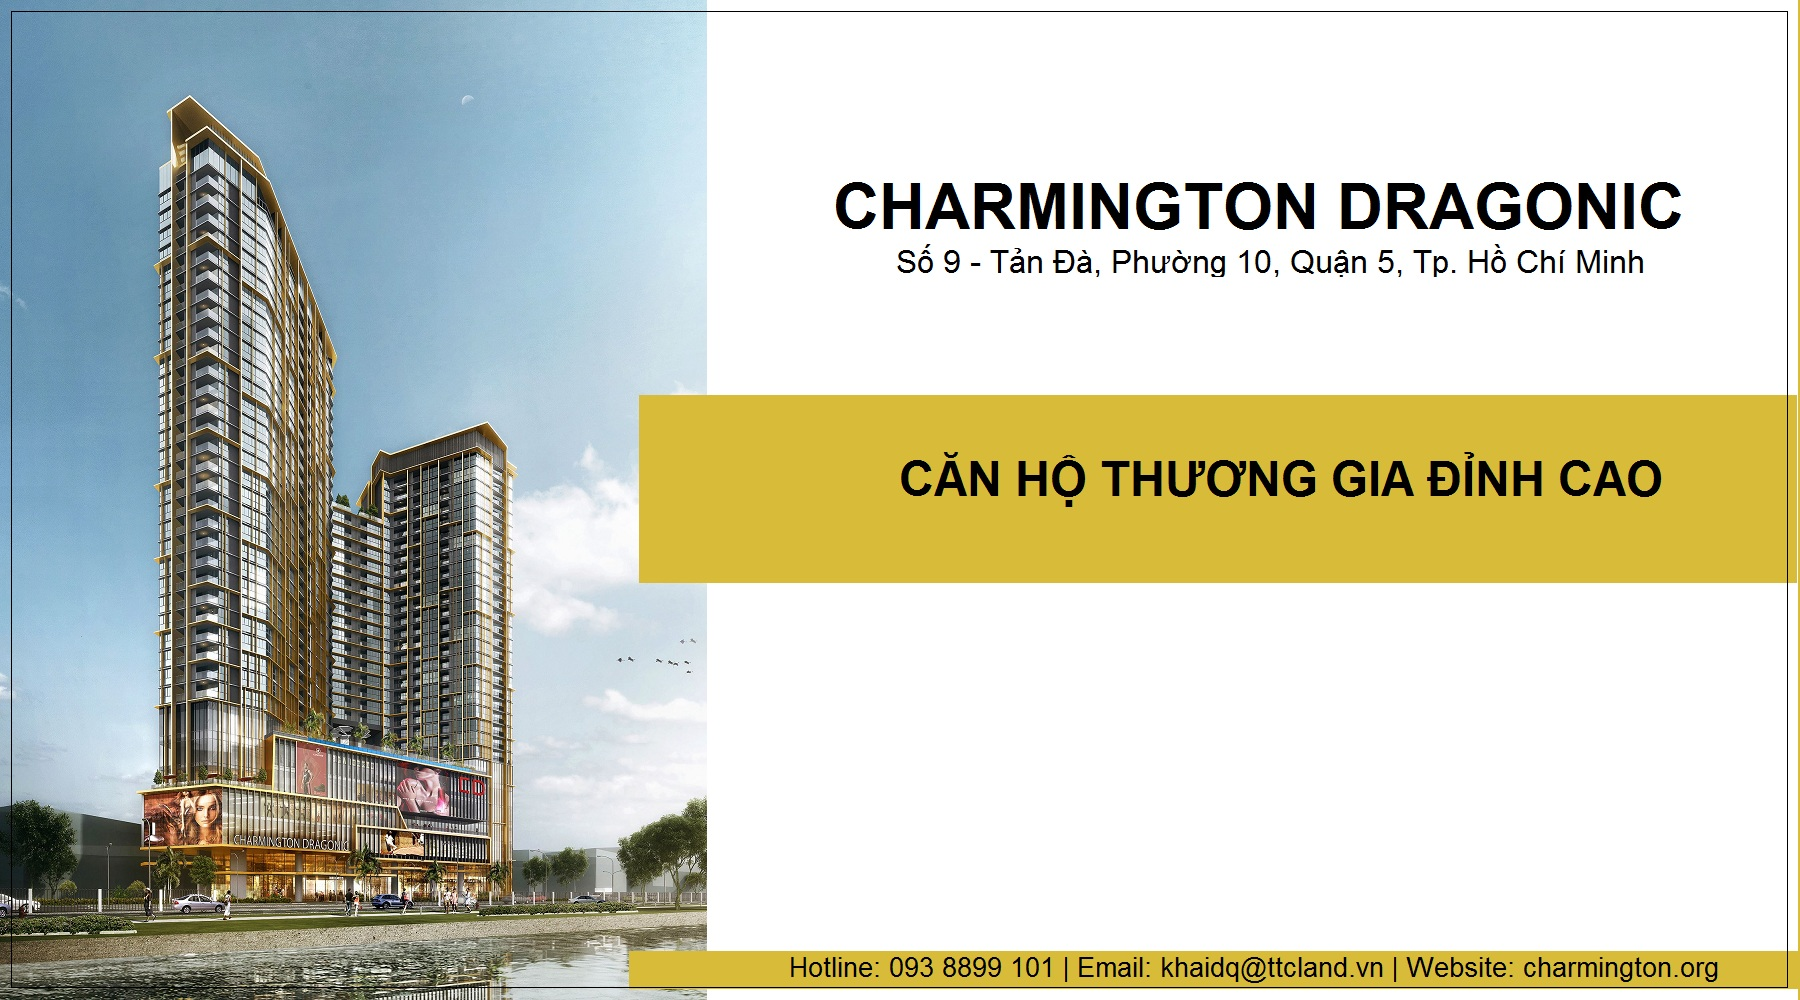 http://charmington.org/public/upload/phoi-canh-charmington-dragonic-charmingtonorg-1553078708.jpg